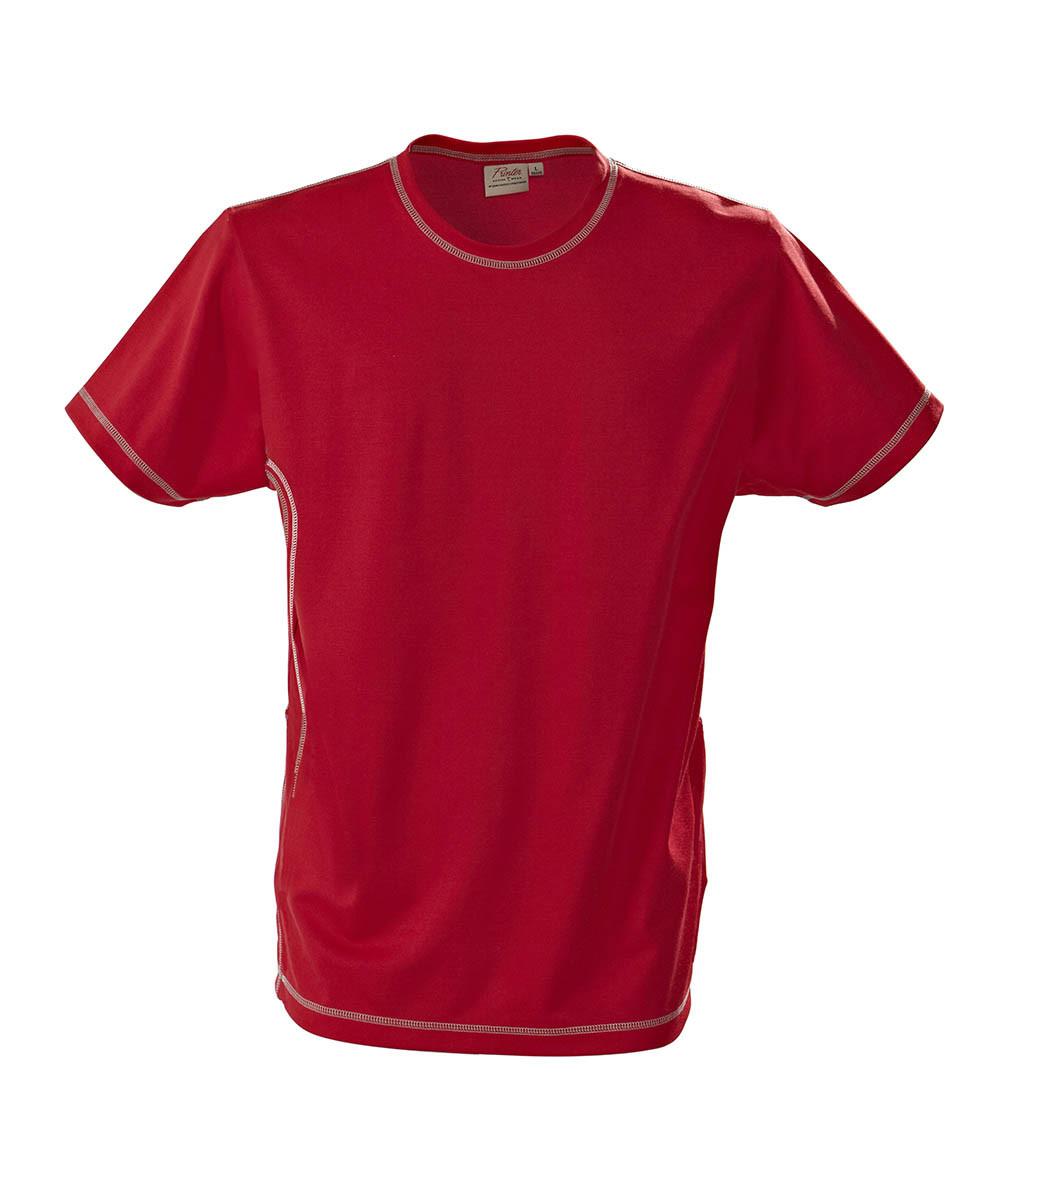 Футболка мужская Sprint от ТМ Printer (цвет красный)